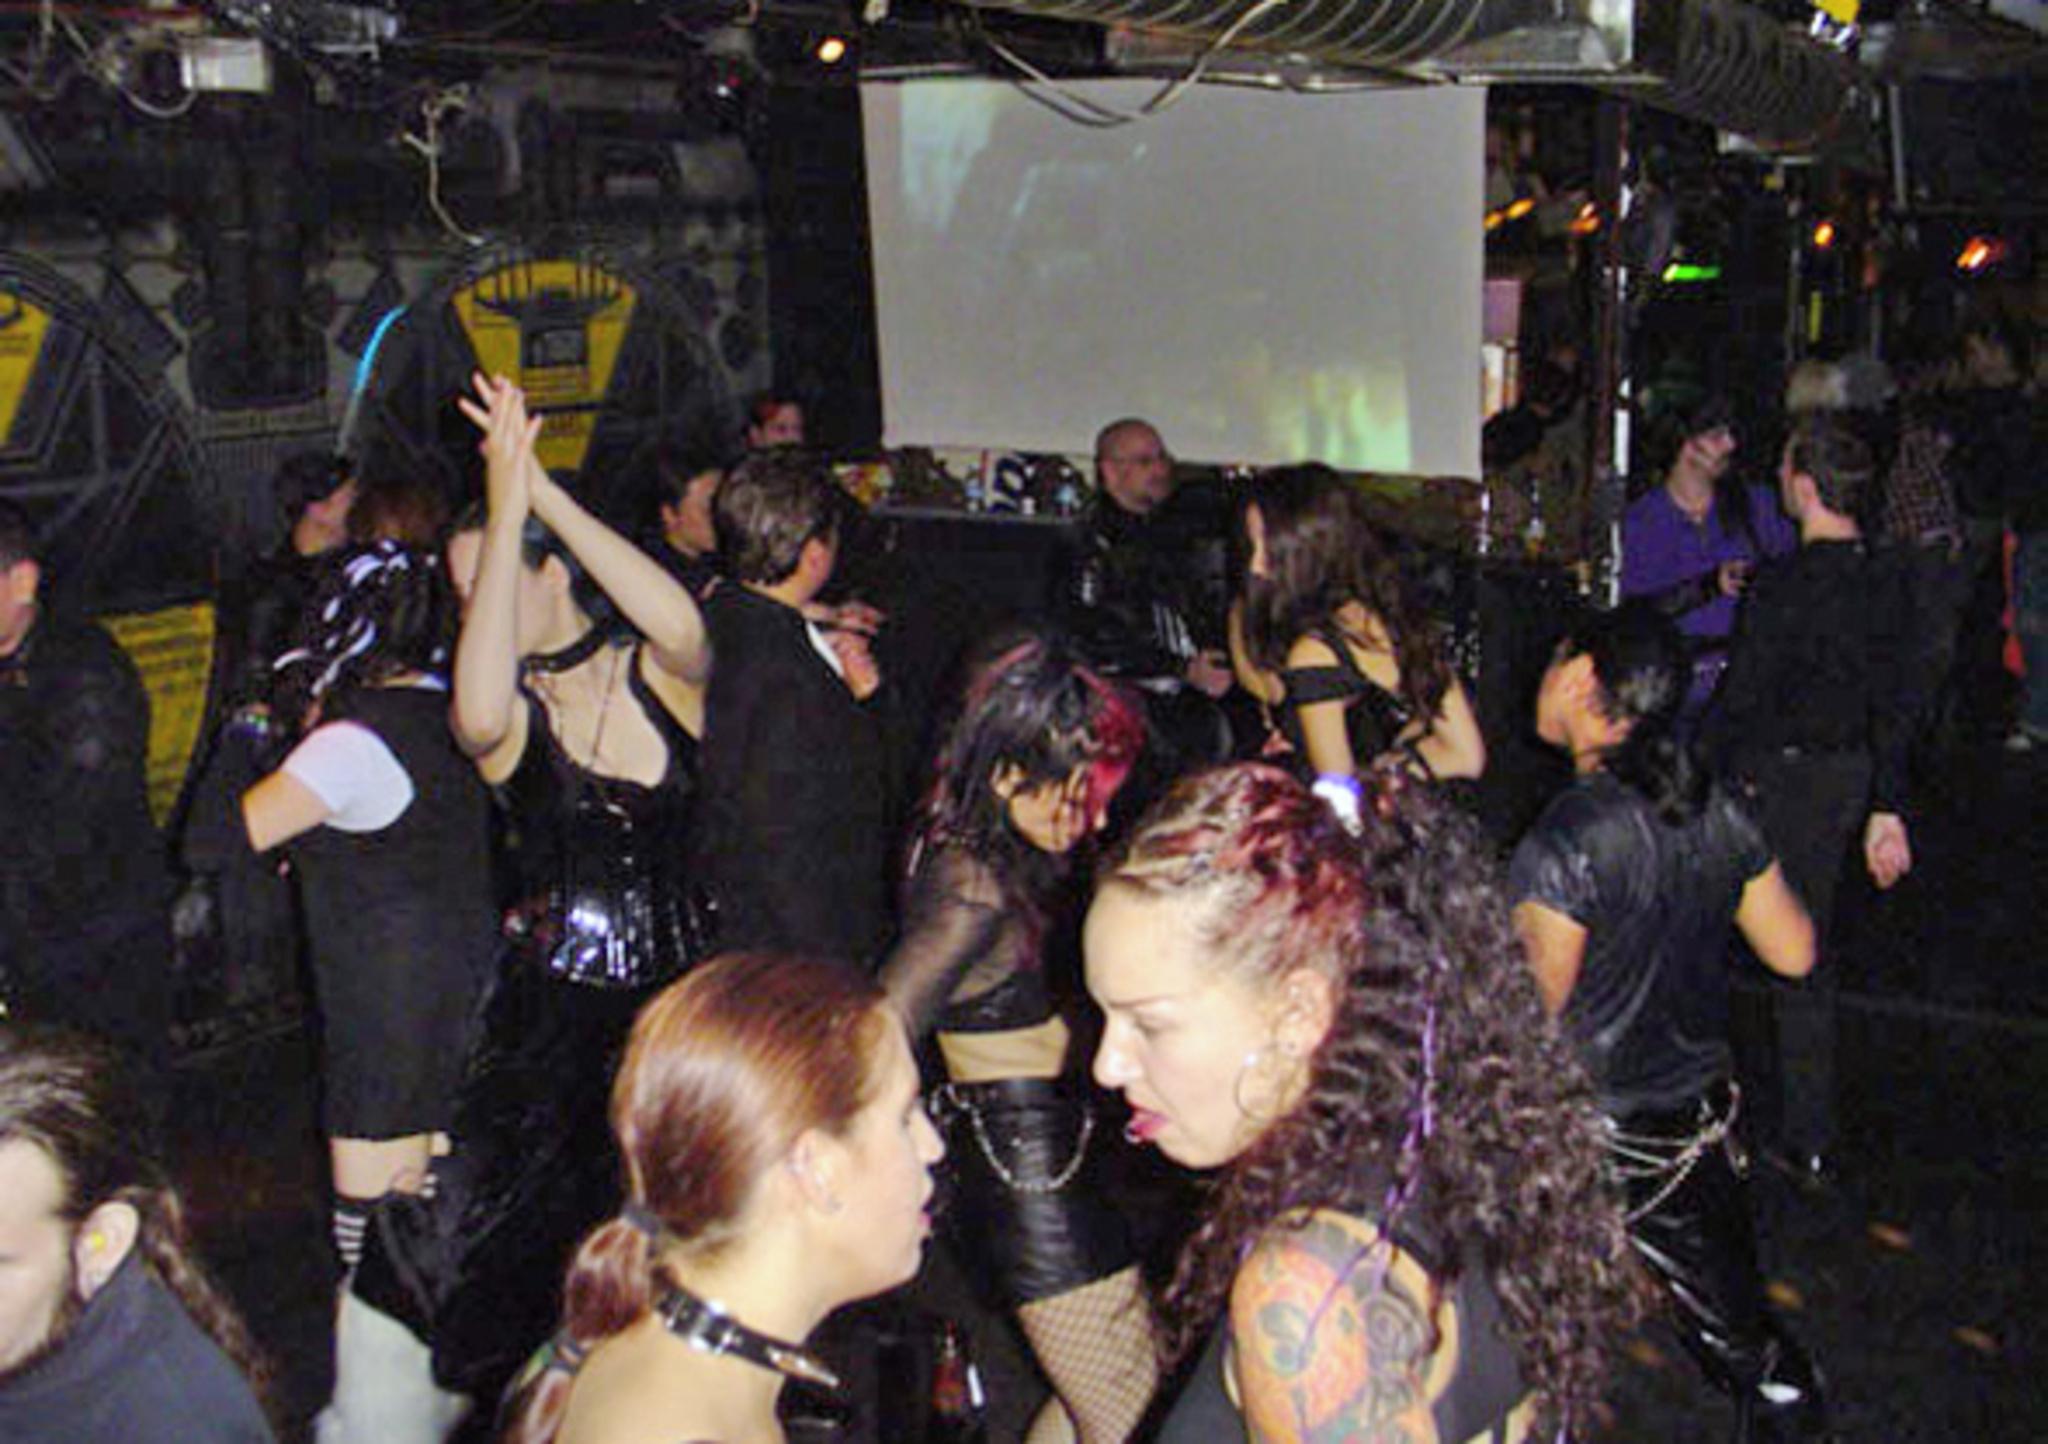 The Top 5 Toronto Goth Haunts We Miss